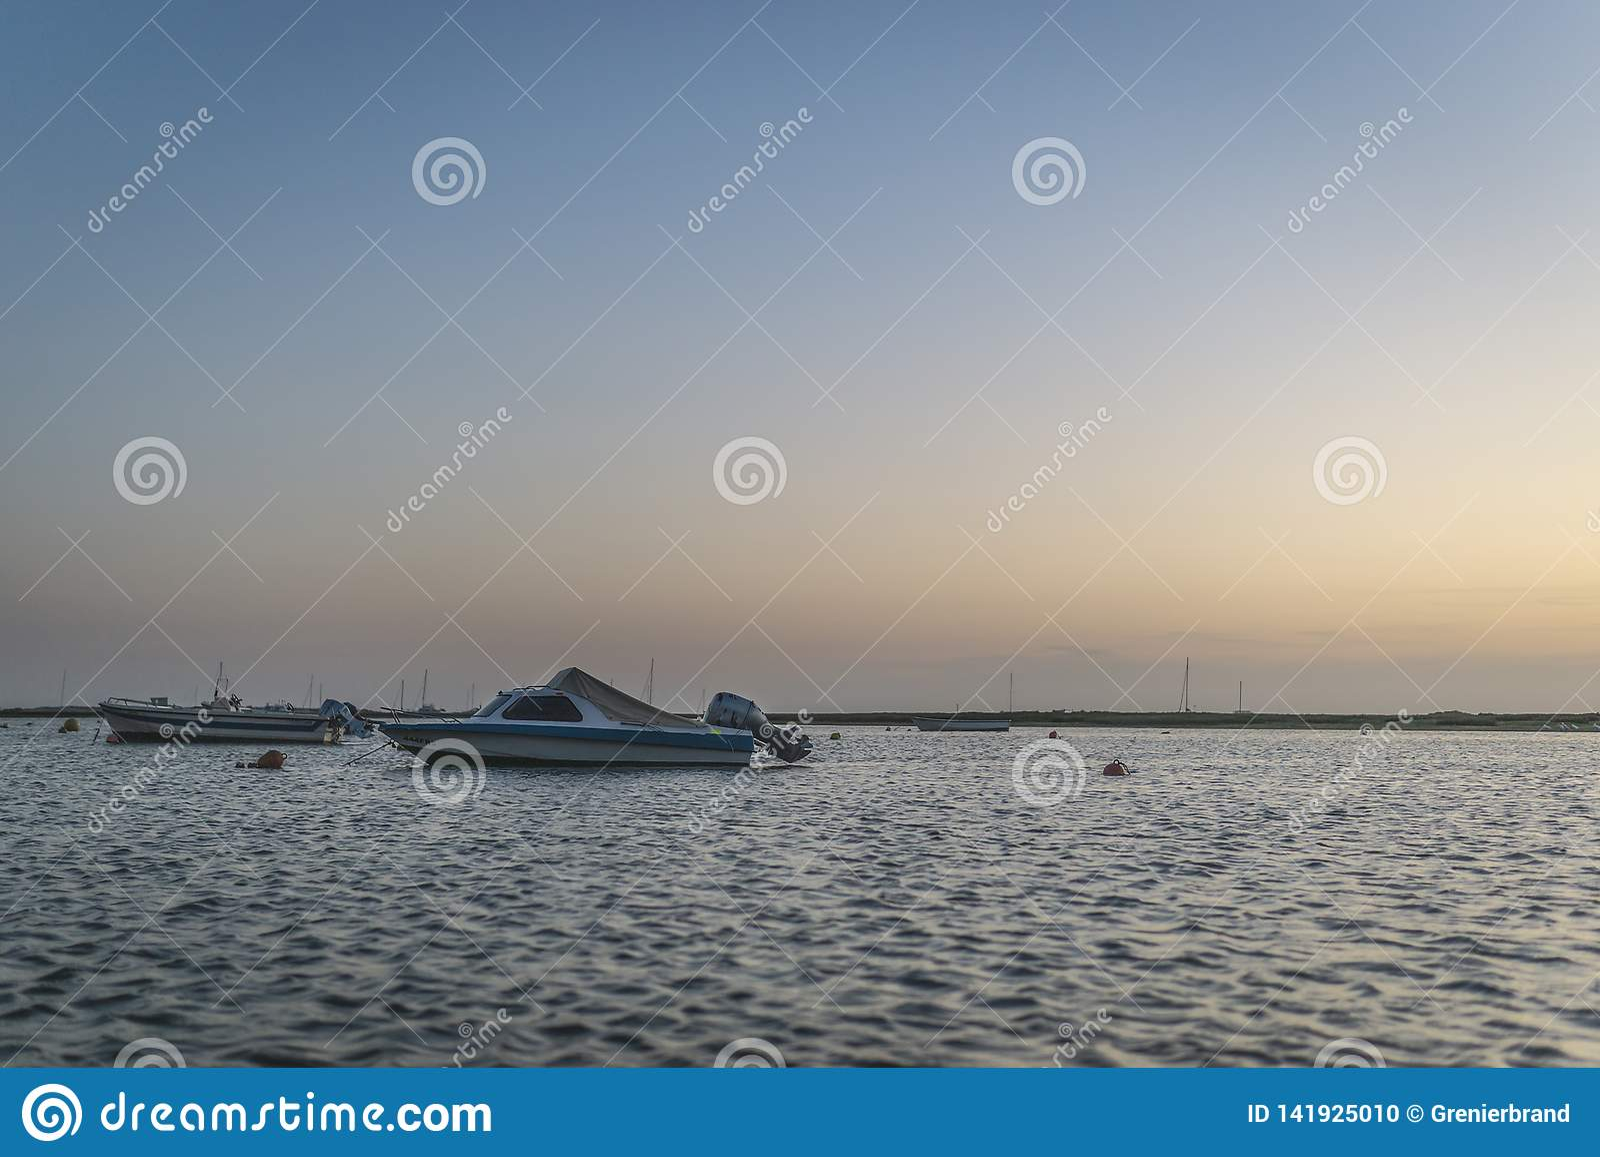 Rio Formosa boats floating at sunset